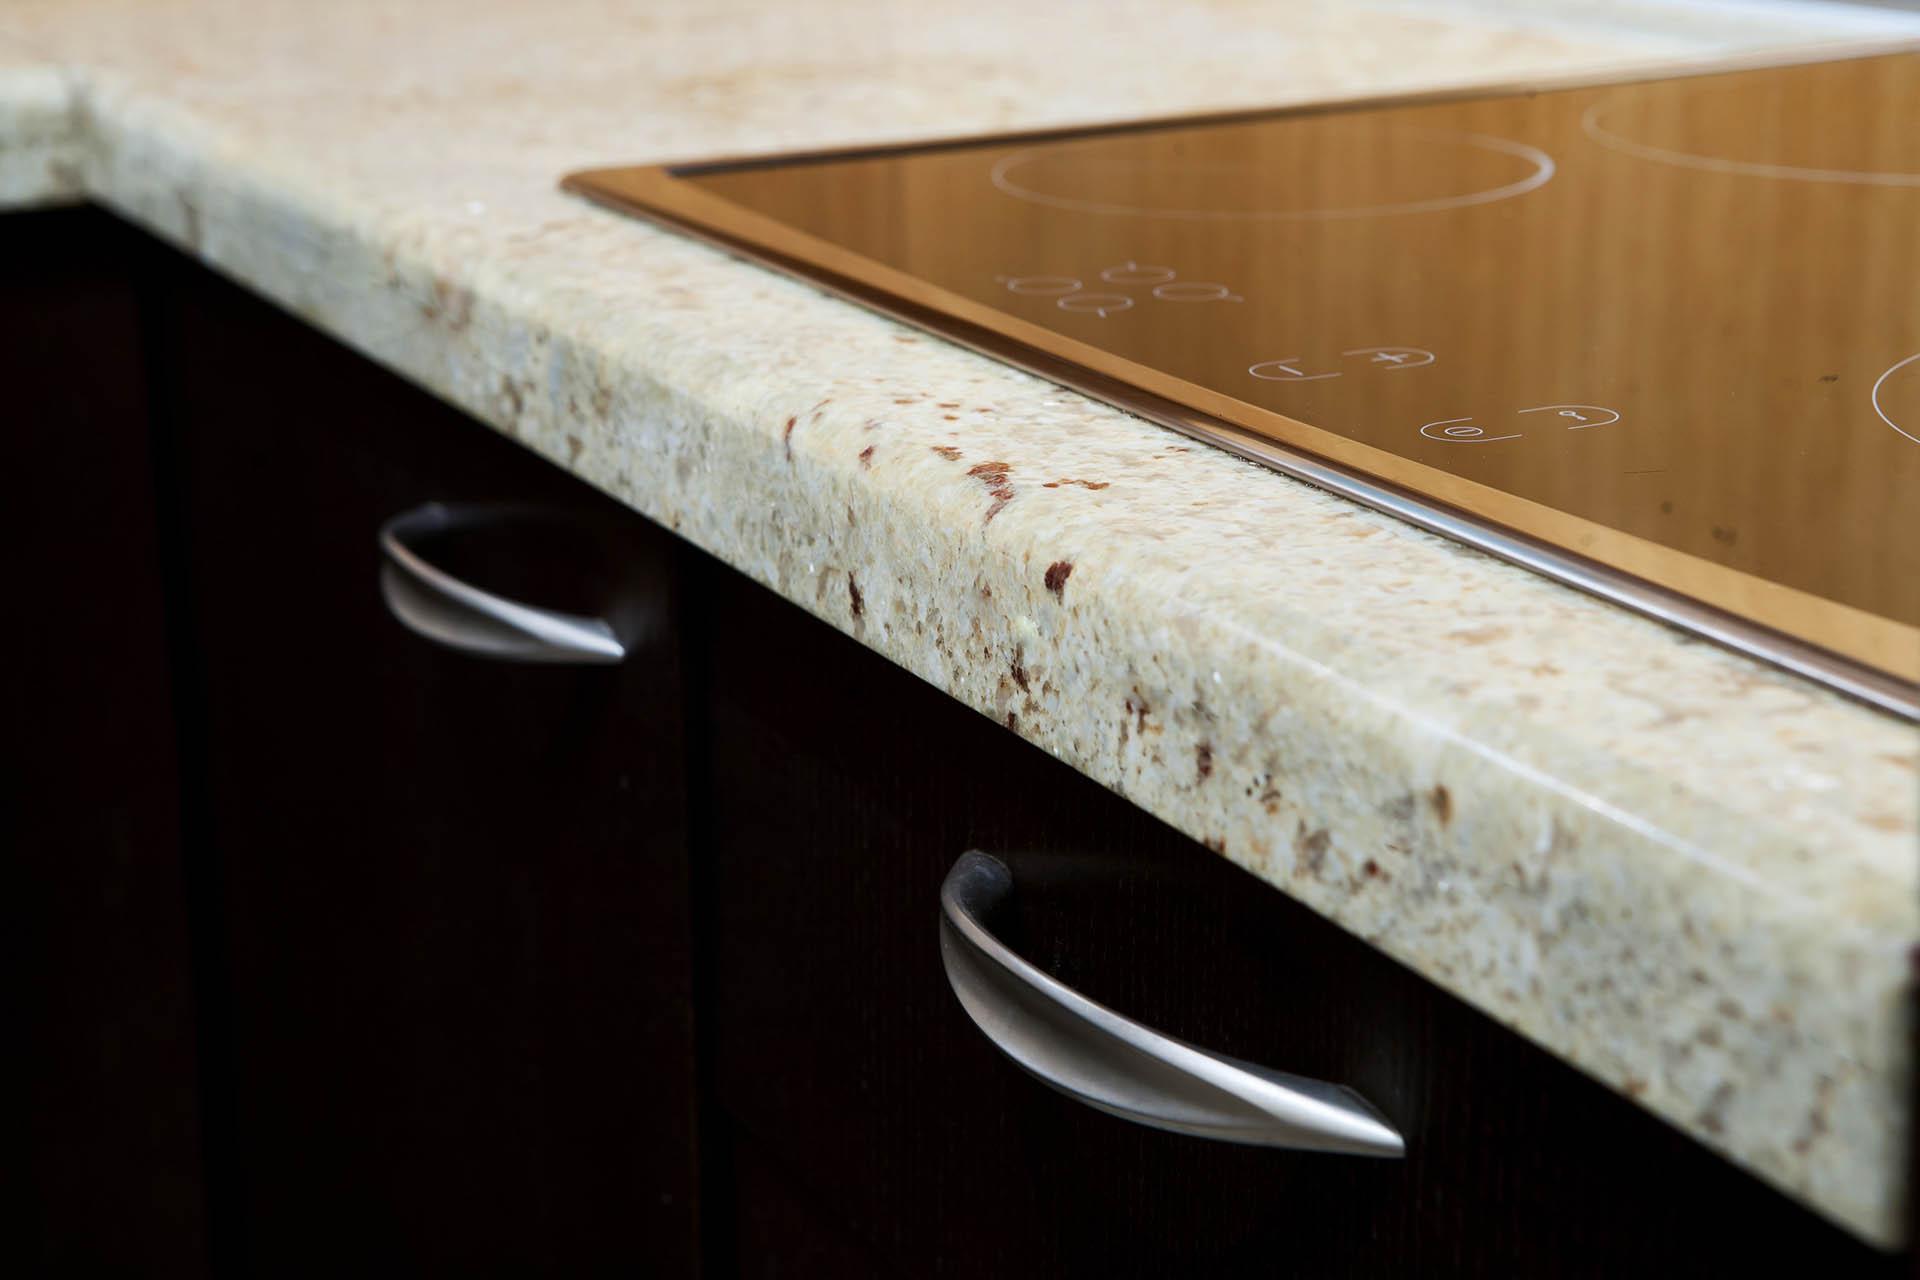 Кухненски плот от гранит Cashmere White и подлепка 2